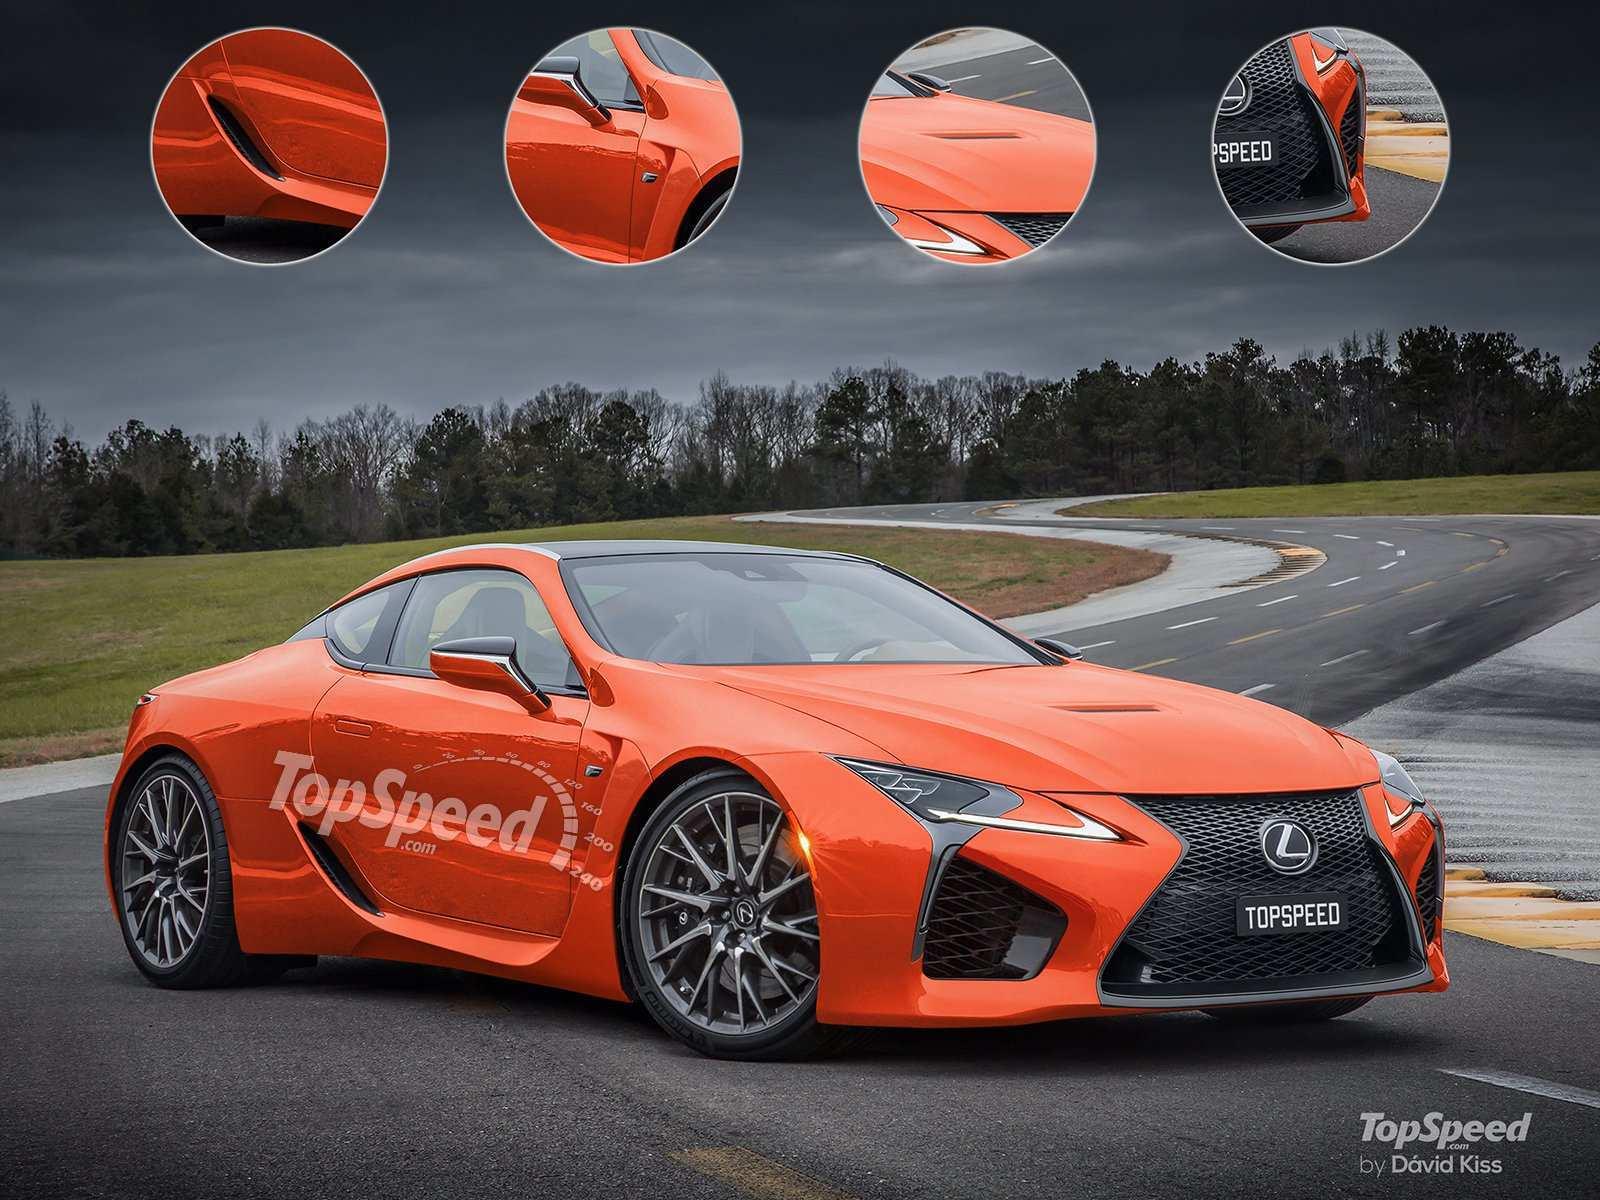 27 All New Lexus 2020 Sports Car Reviews for Lexus 2020 Sports Car